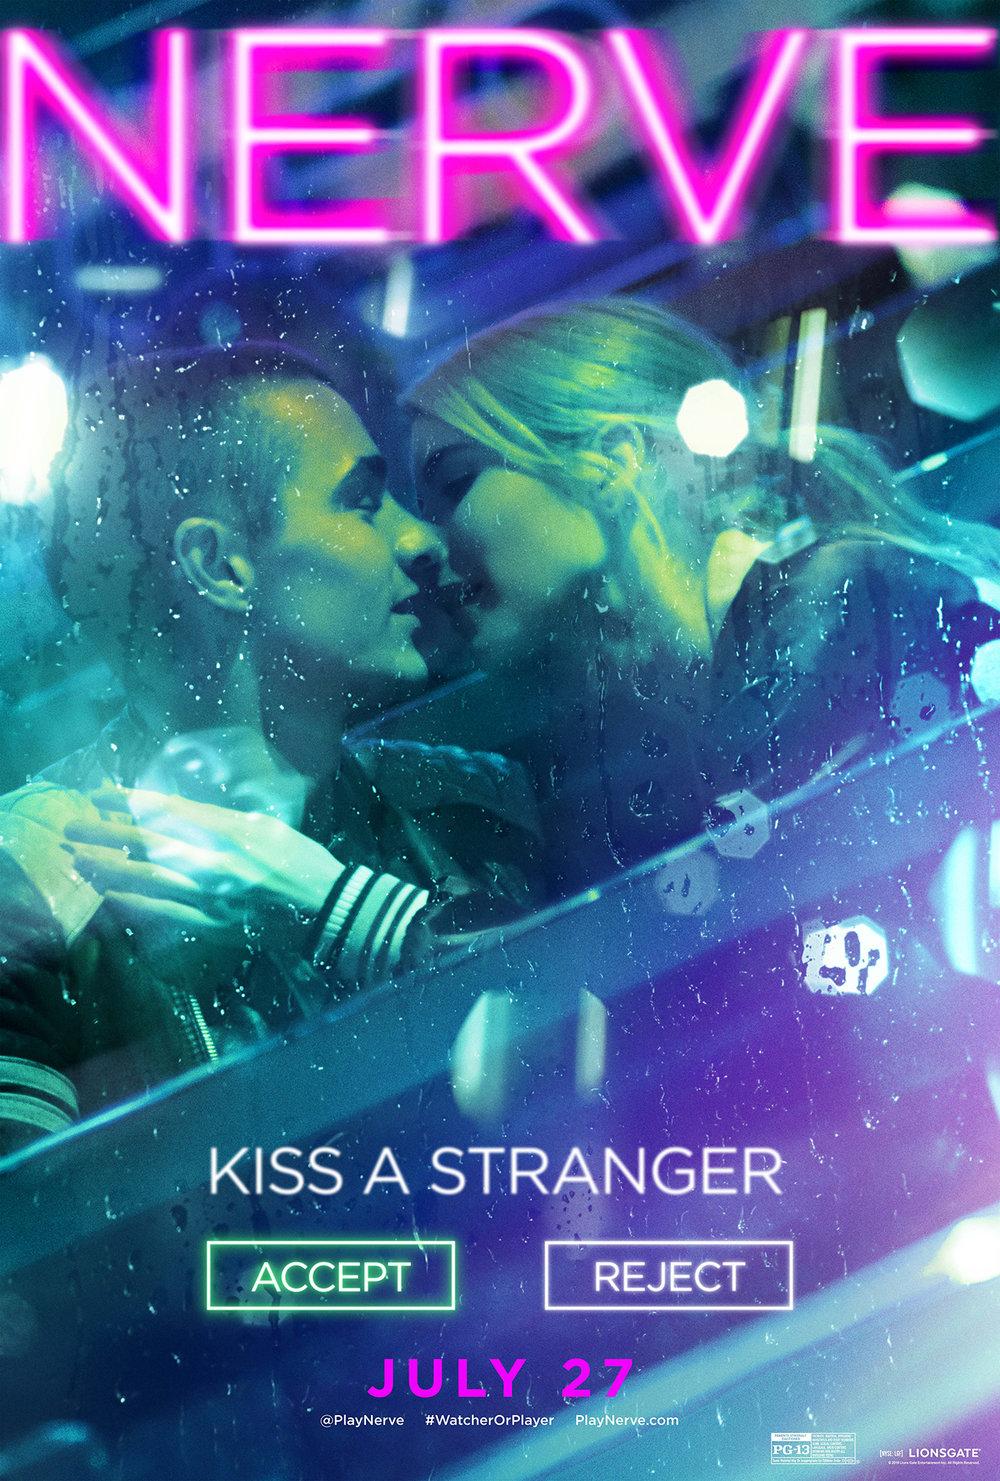 Nerve_Online_1Sht_Kiss_100dpi.jpg